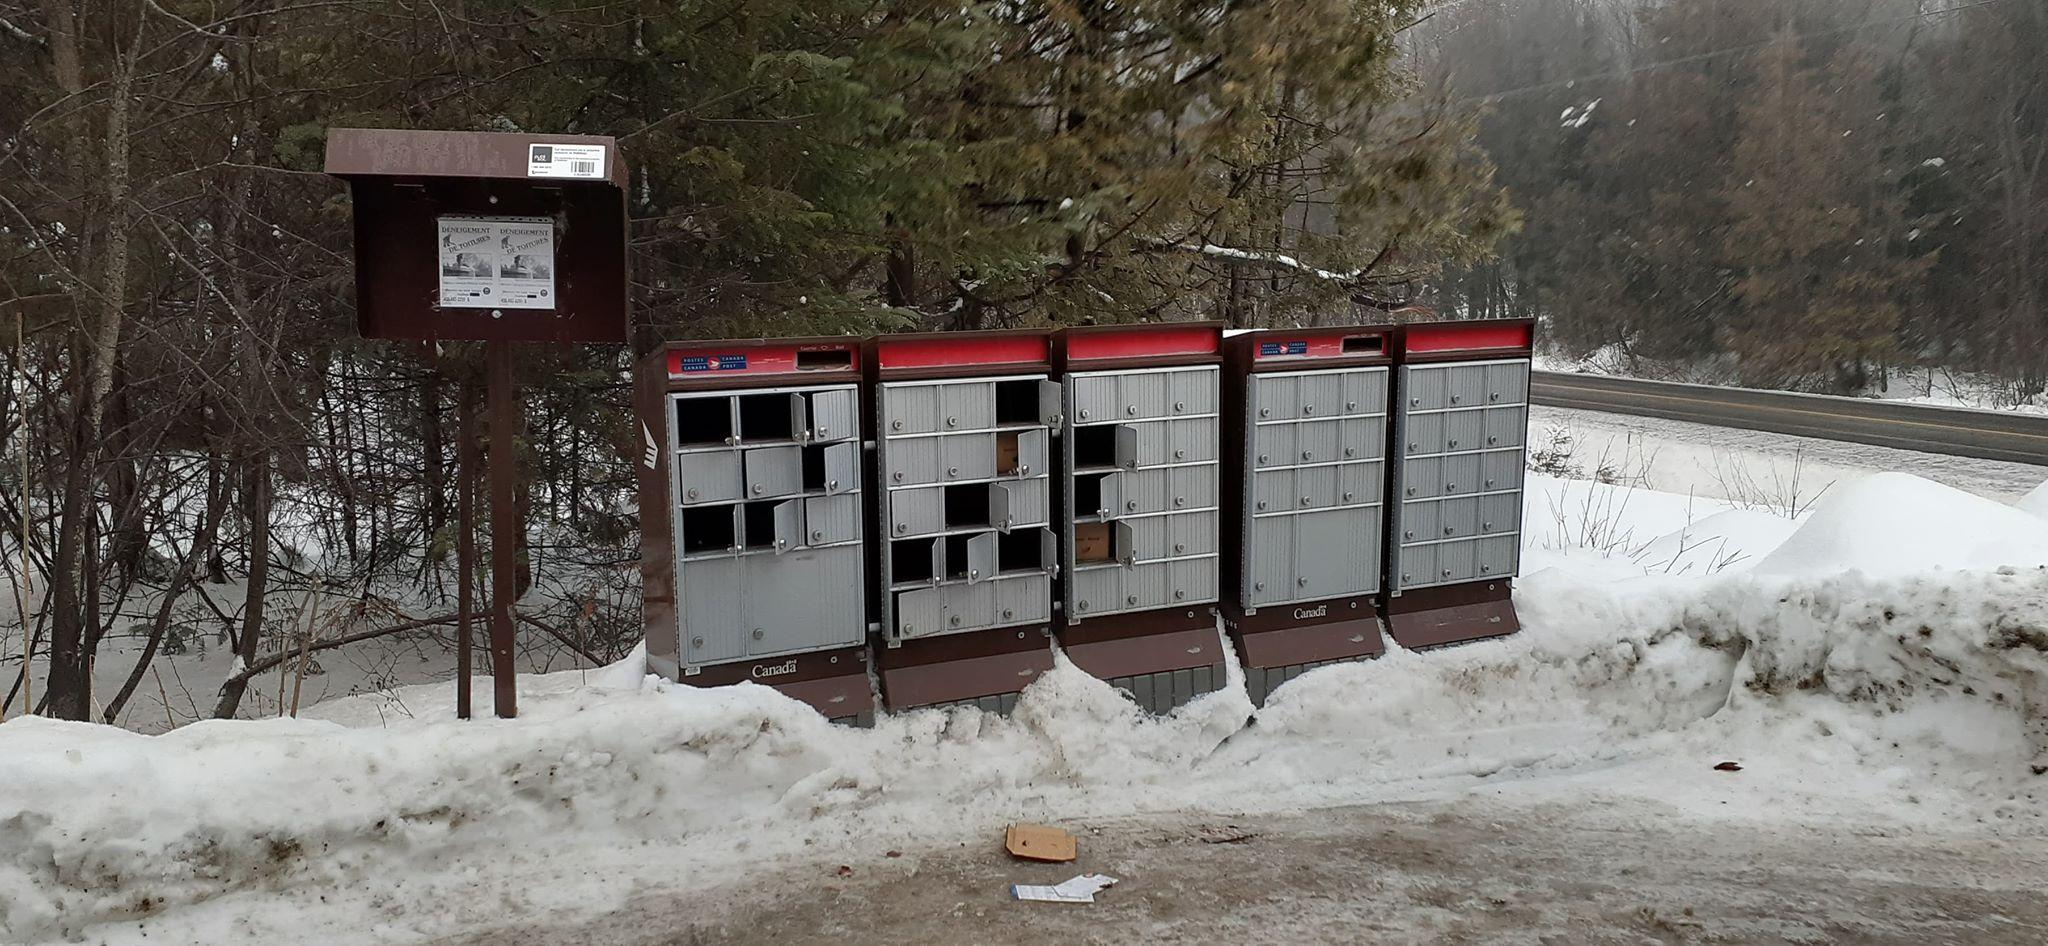 Boîtes postales communautaires